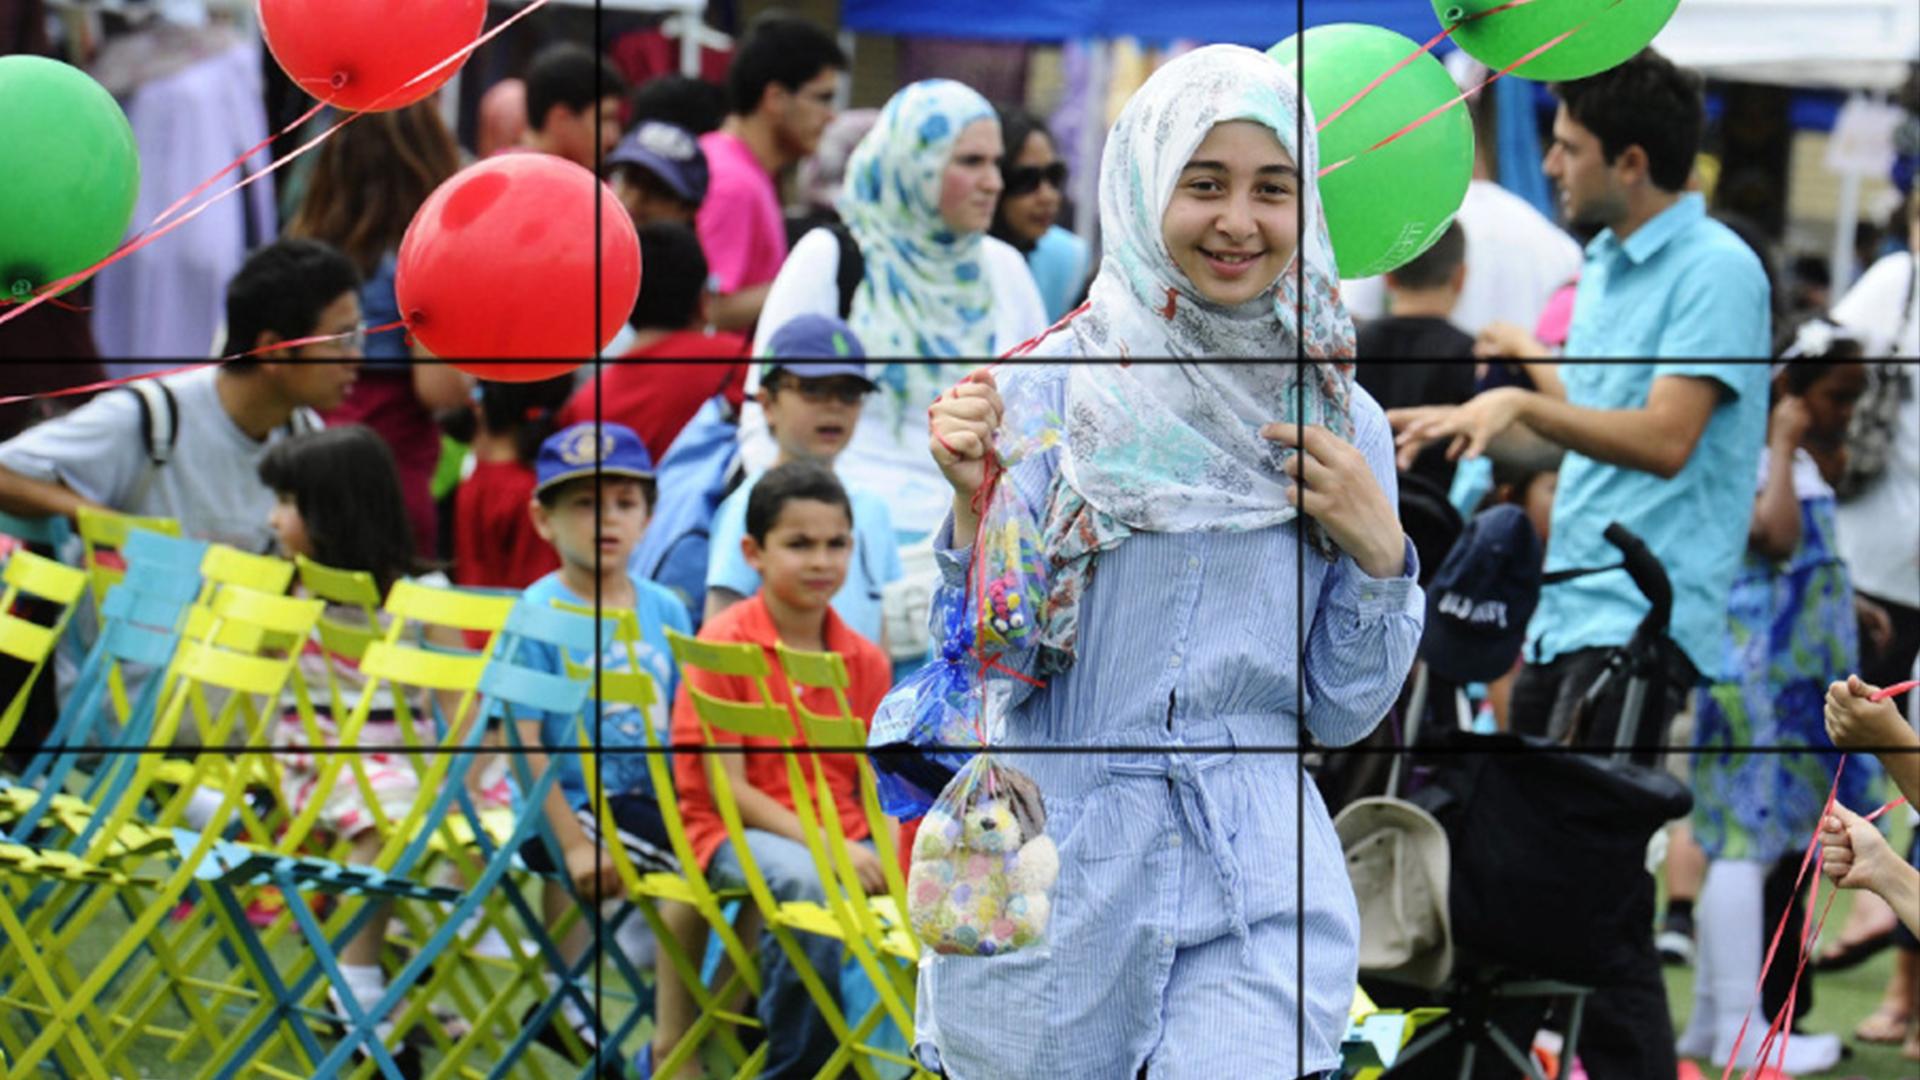 Photo of Canadian Muslims volunteering to clean Halifax Park in Nova Scotia